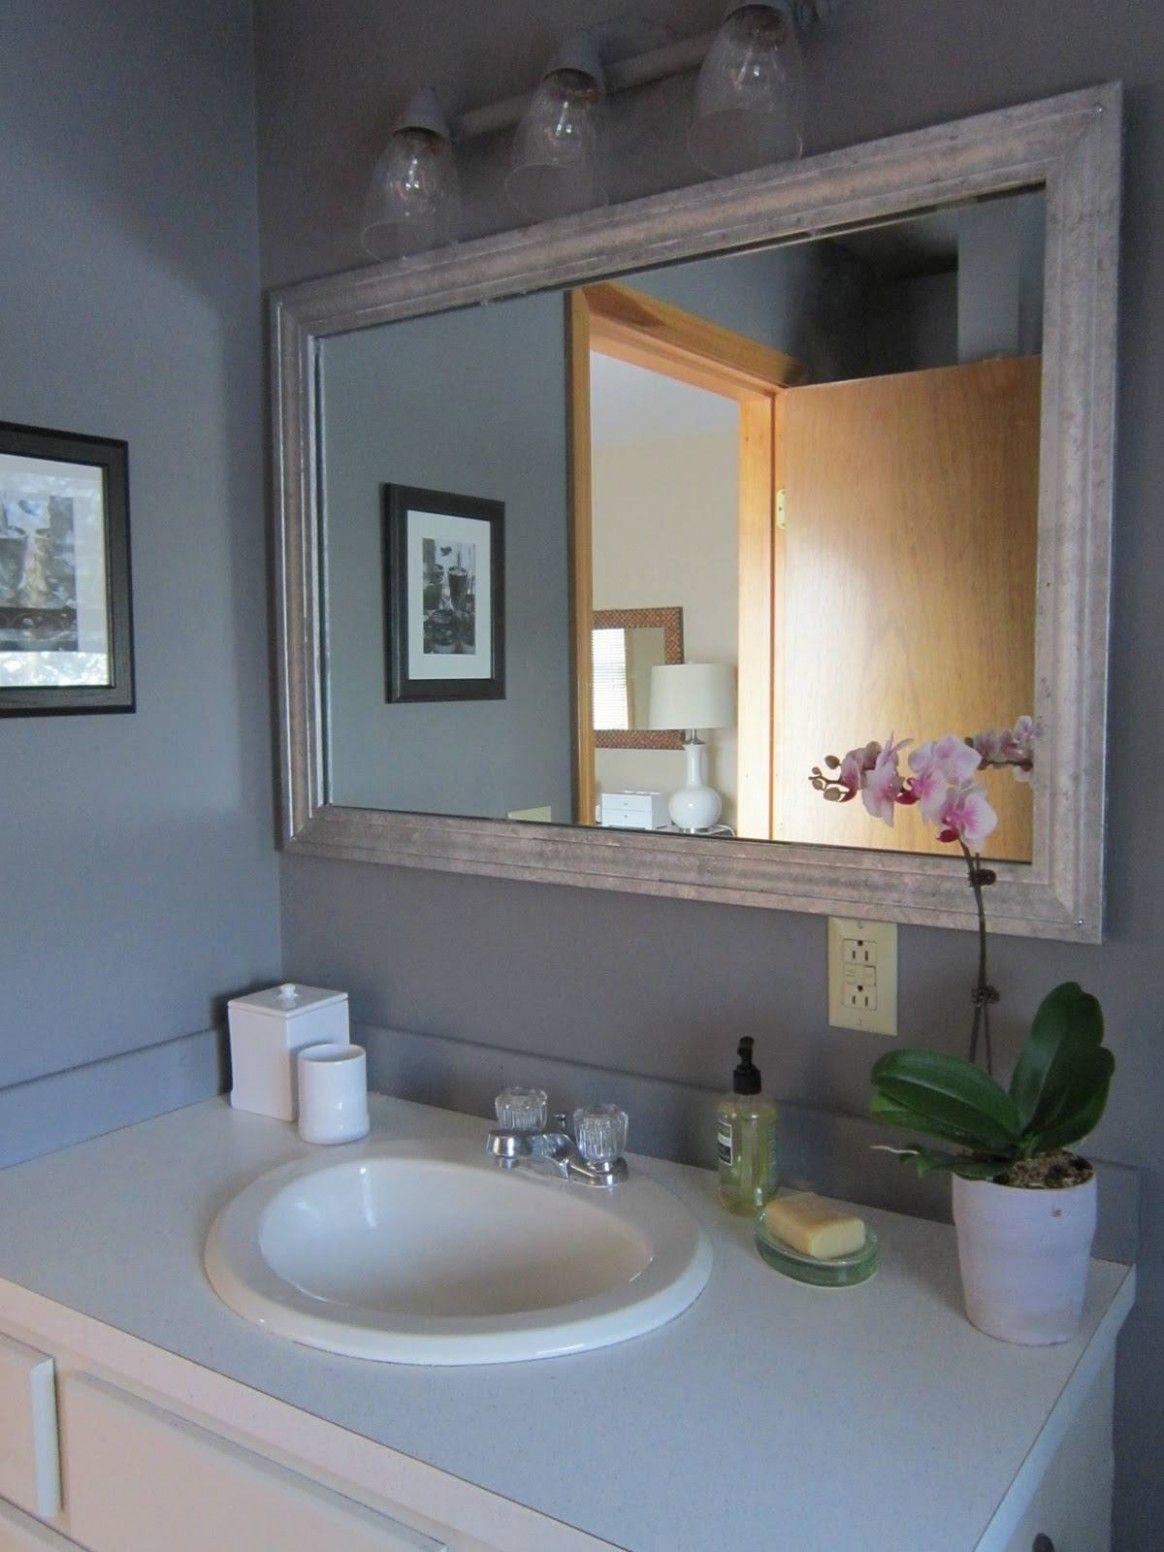 Bathroom Over Mirror Lights Ikea in 7 (With images)  Bathroom